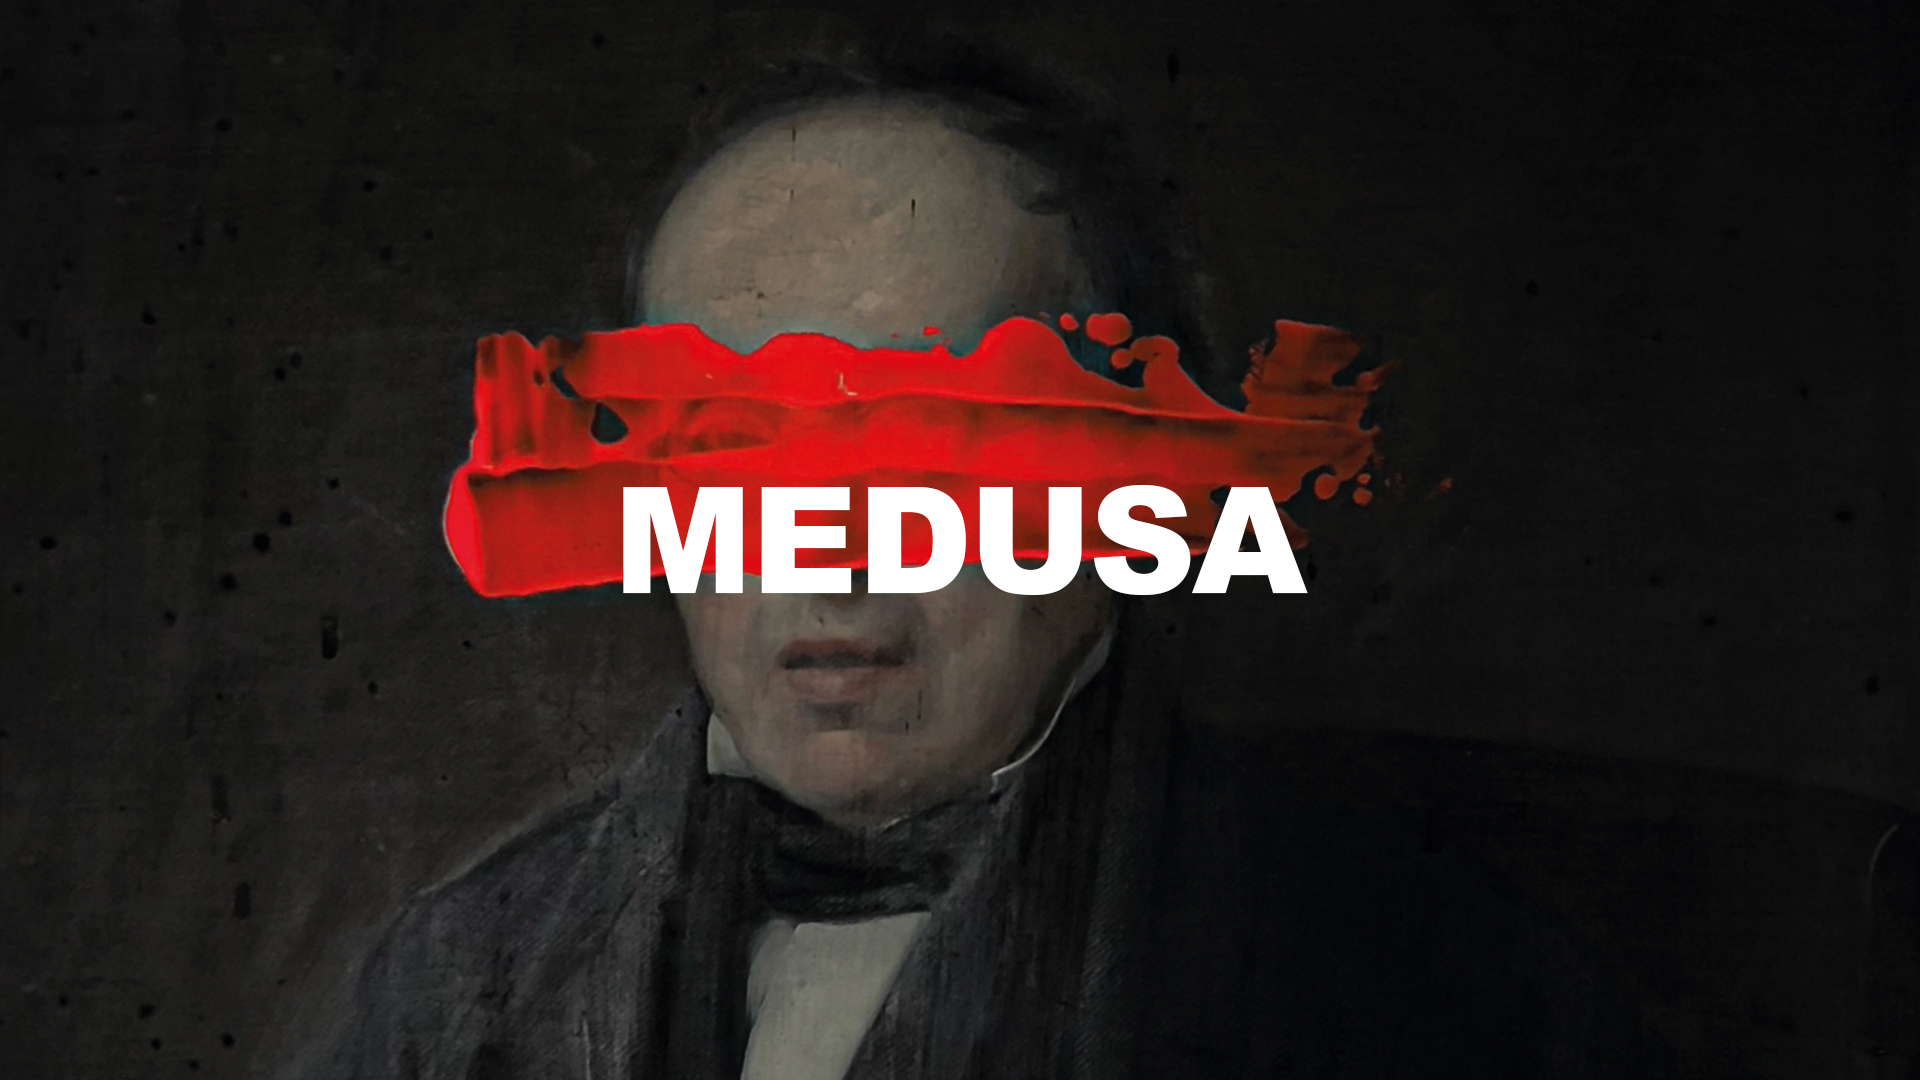 MEDUSA-AARON-NACHTAILER-ART-ARTIST-PAINTING-COVER